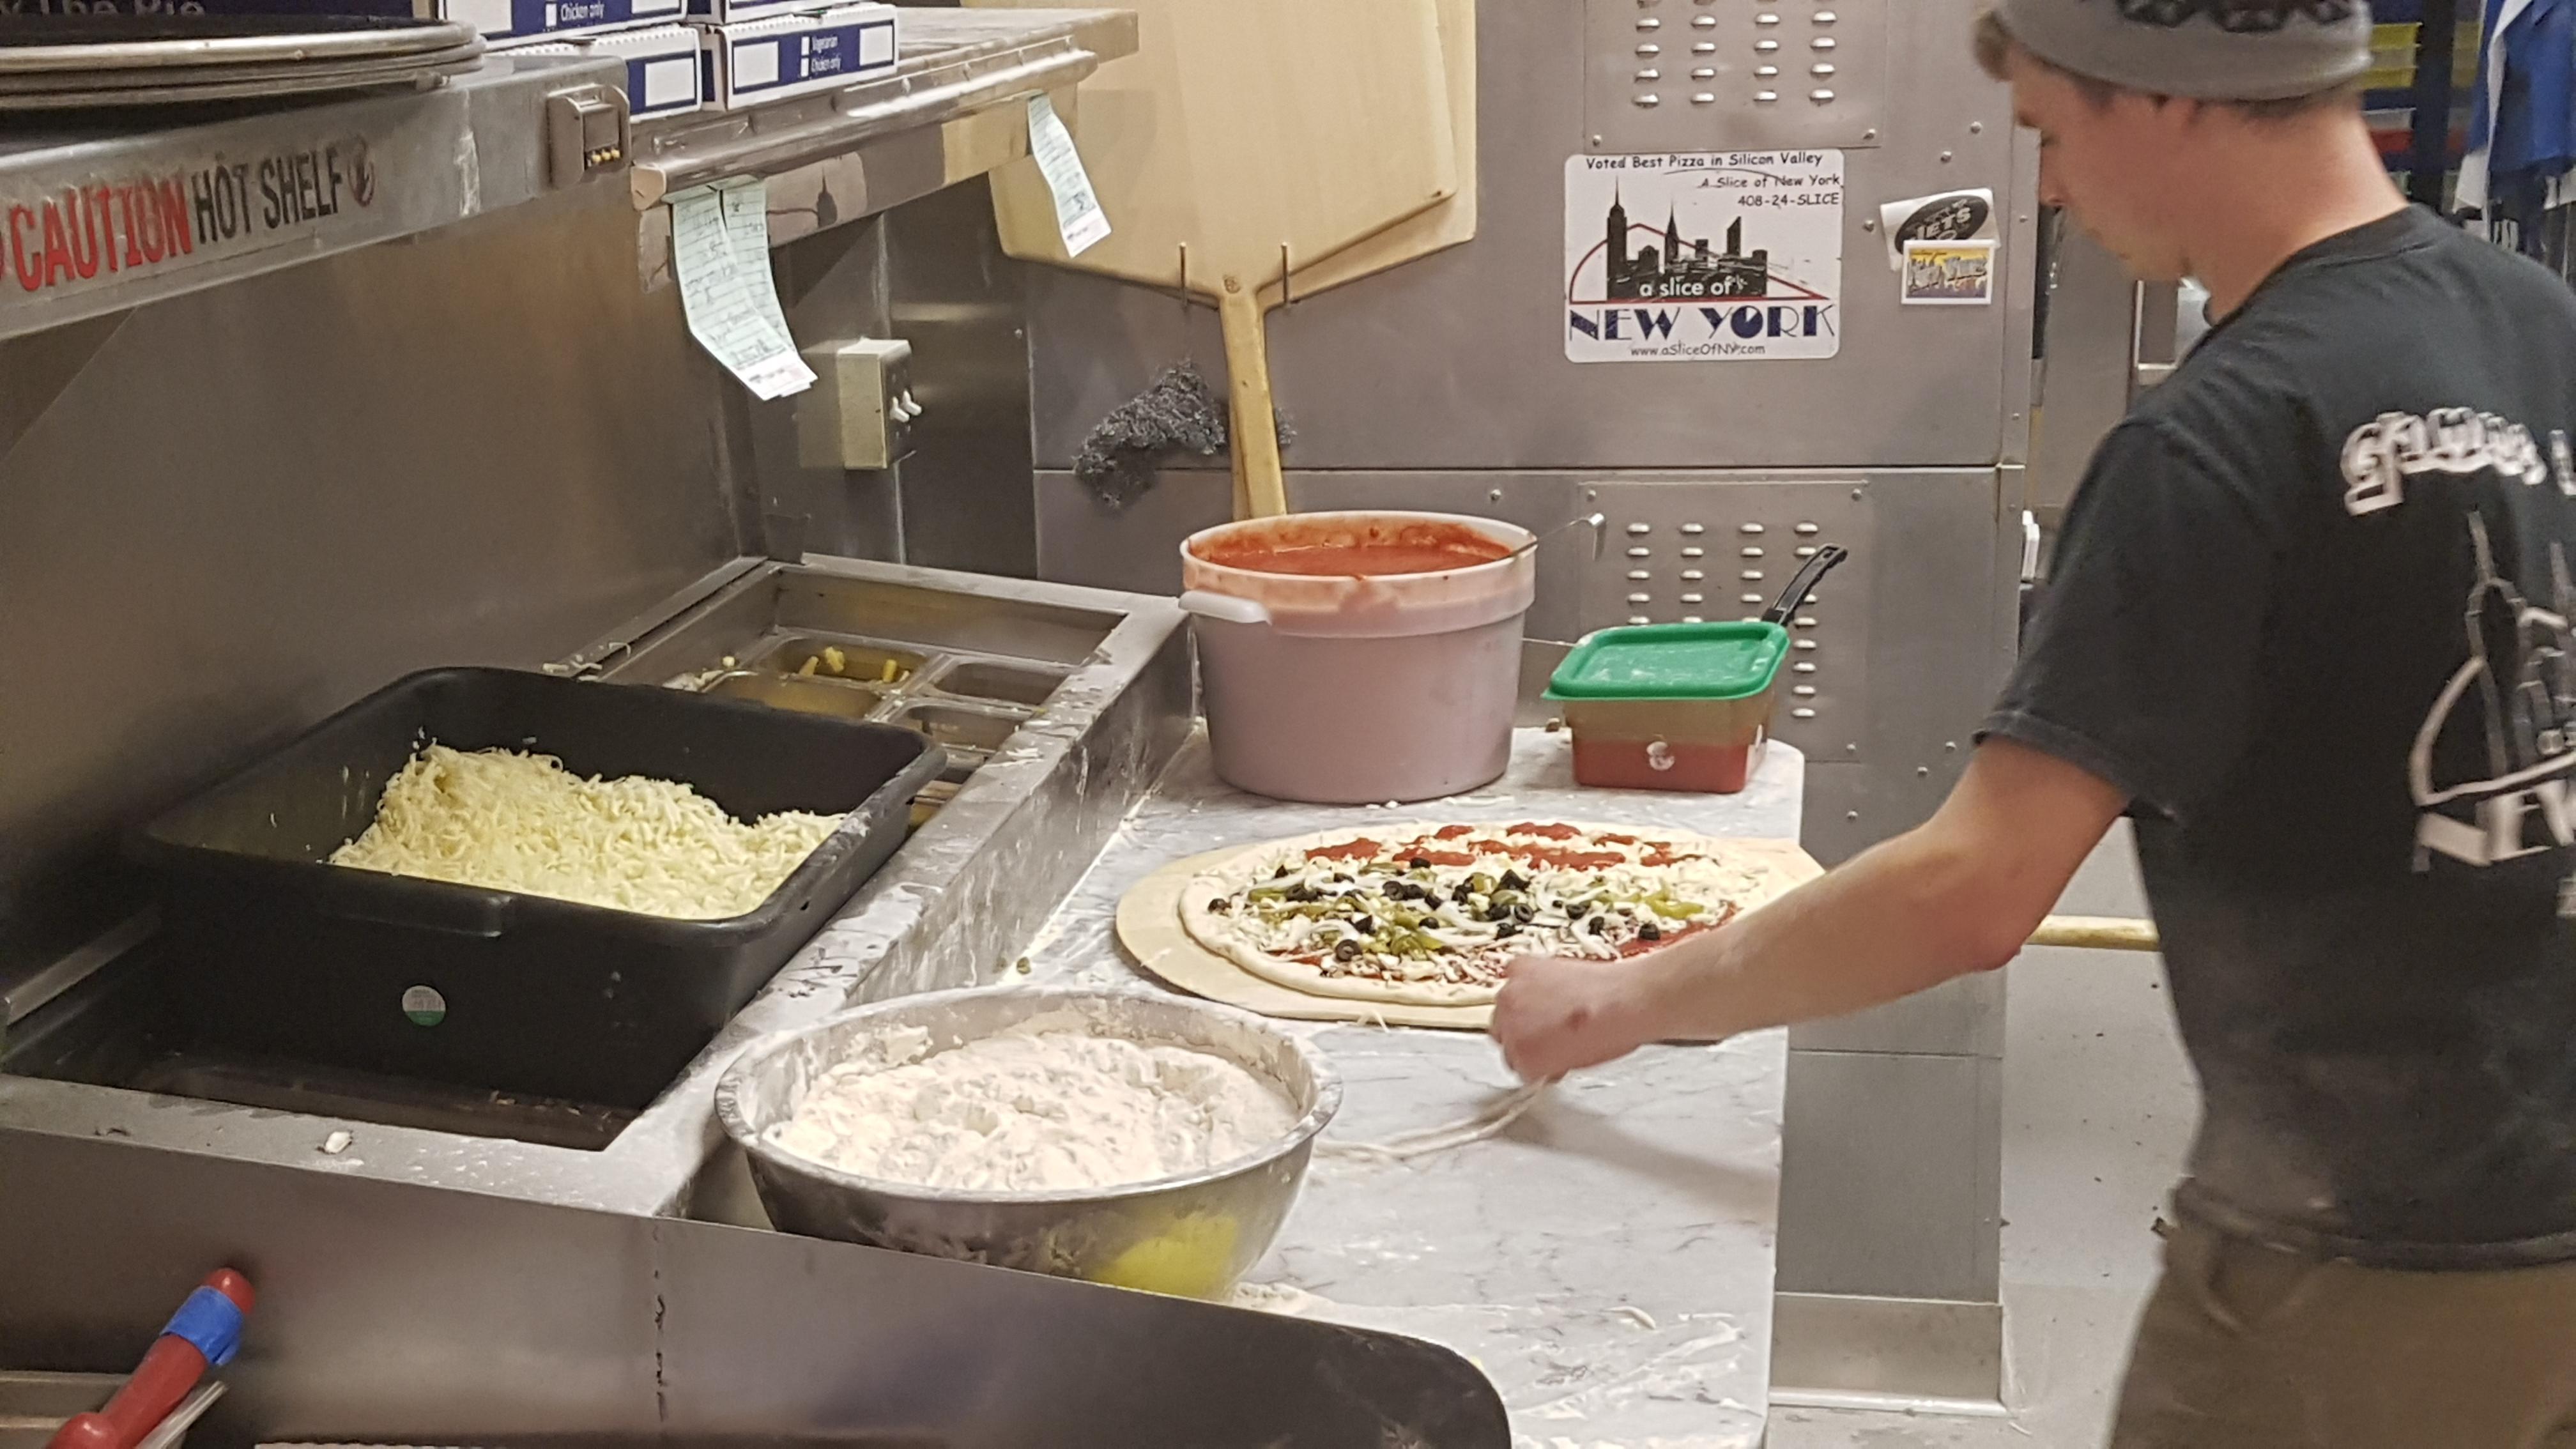 bensonhurst, Buffalo Chicken, ipa, large, new york pizza, pale ale, sierra nevada pale ale, The City, Times Square, [산호세] 미국에 왔음 미국 본토 피자를 먹어봐야지?, 가격, 간, 뉴욕 피자, 도우, 맛 차이, 맛집, 메뉴, 메뉴판, 미국, 미국 본토 피자, 미국 피자, 미국지사, 버팔로 치킨, 본토 피자, 사이즈, 산호세, 소스, 술, 자부심, 잘 나가는 피자집, 재료, 재료 듬뿍, 짱M, 쫄깃쫄깃, 치즈, 페일 에일, 프렌차이즈, 피자 비교, 피자마루, 피자스쿨, 피자와 어울리는 도우